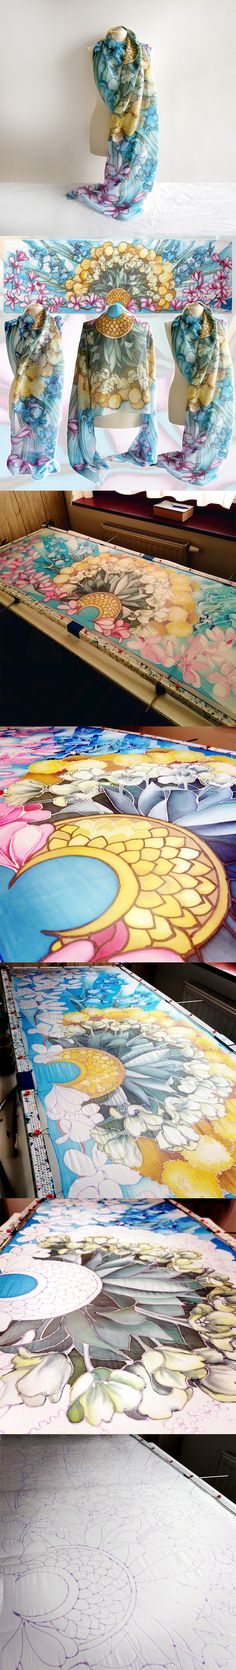 Steps of painting the Bouquet Flowers silk scarf. #silk #scarf #bouquet #flowers #floral #minkulul Luiza #Malinowska